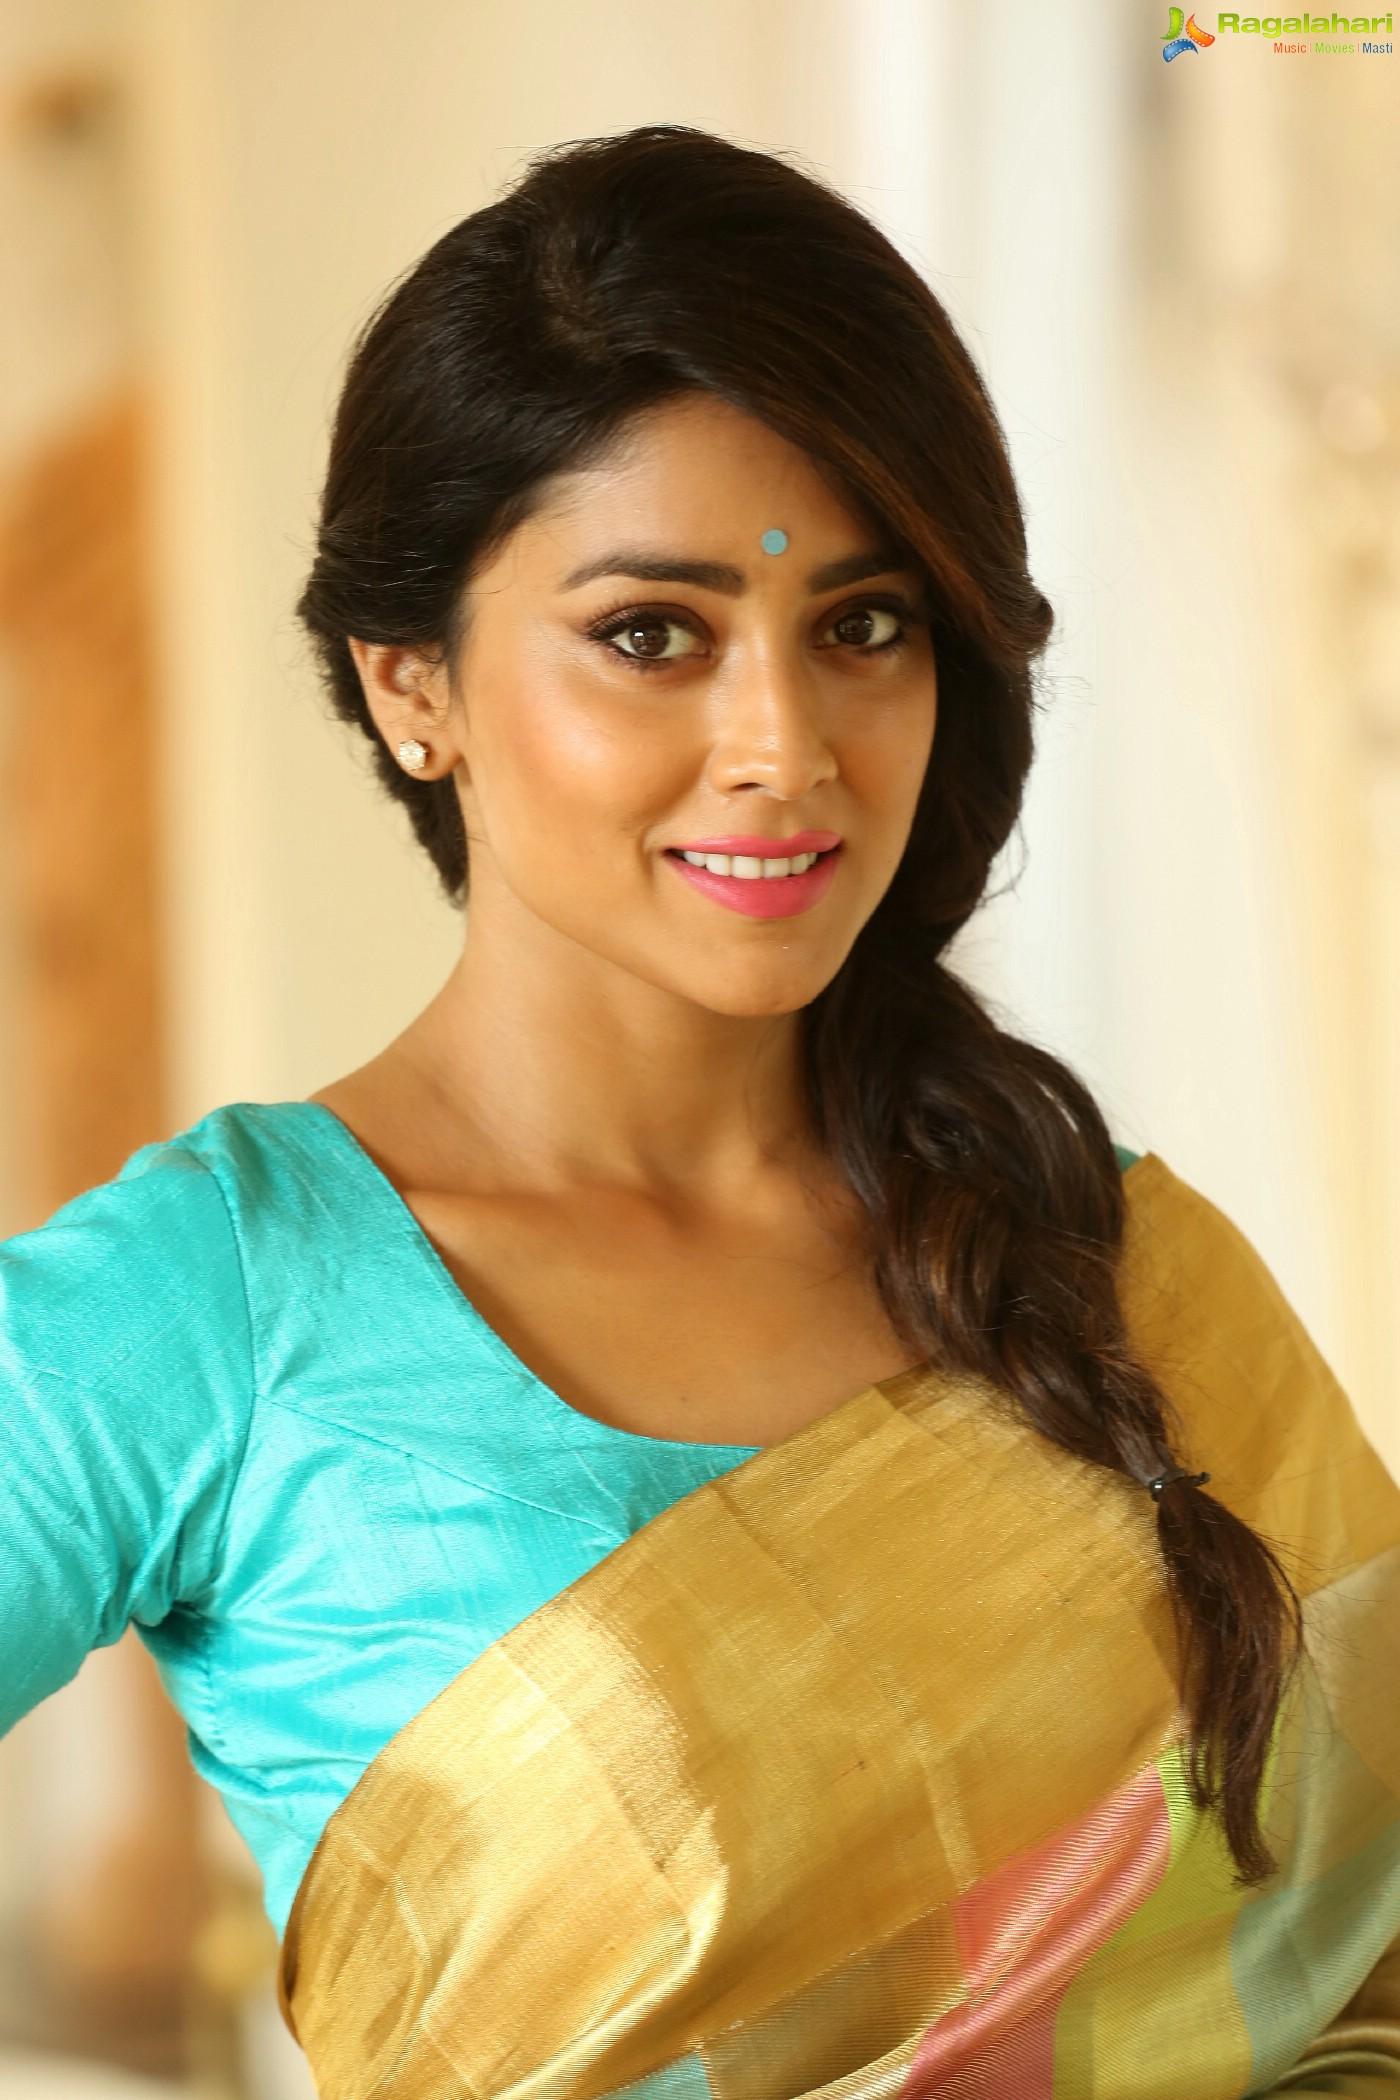 Shriya Saran (Posters) Image 1   Telugu Actress Gallery ...